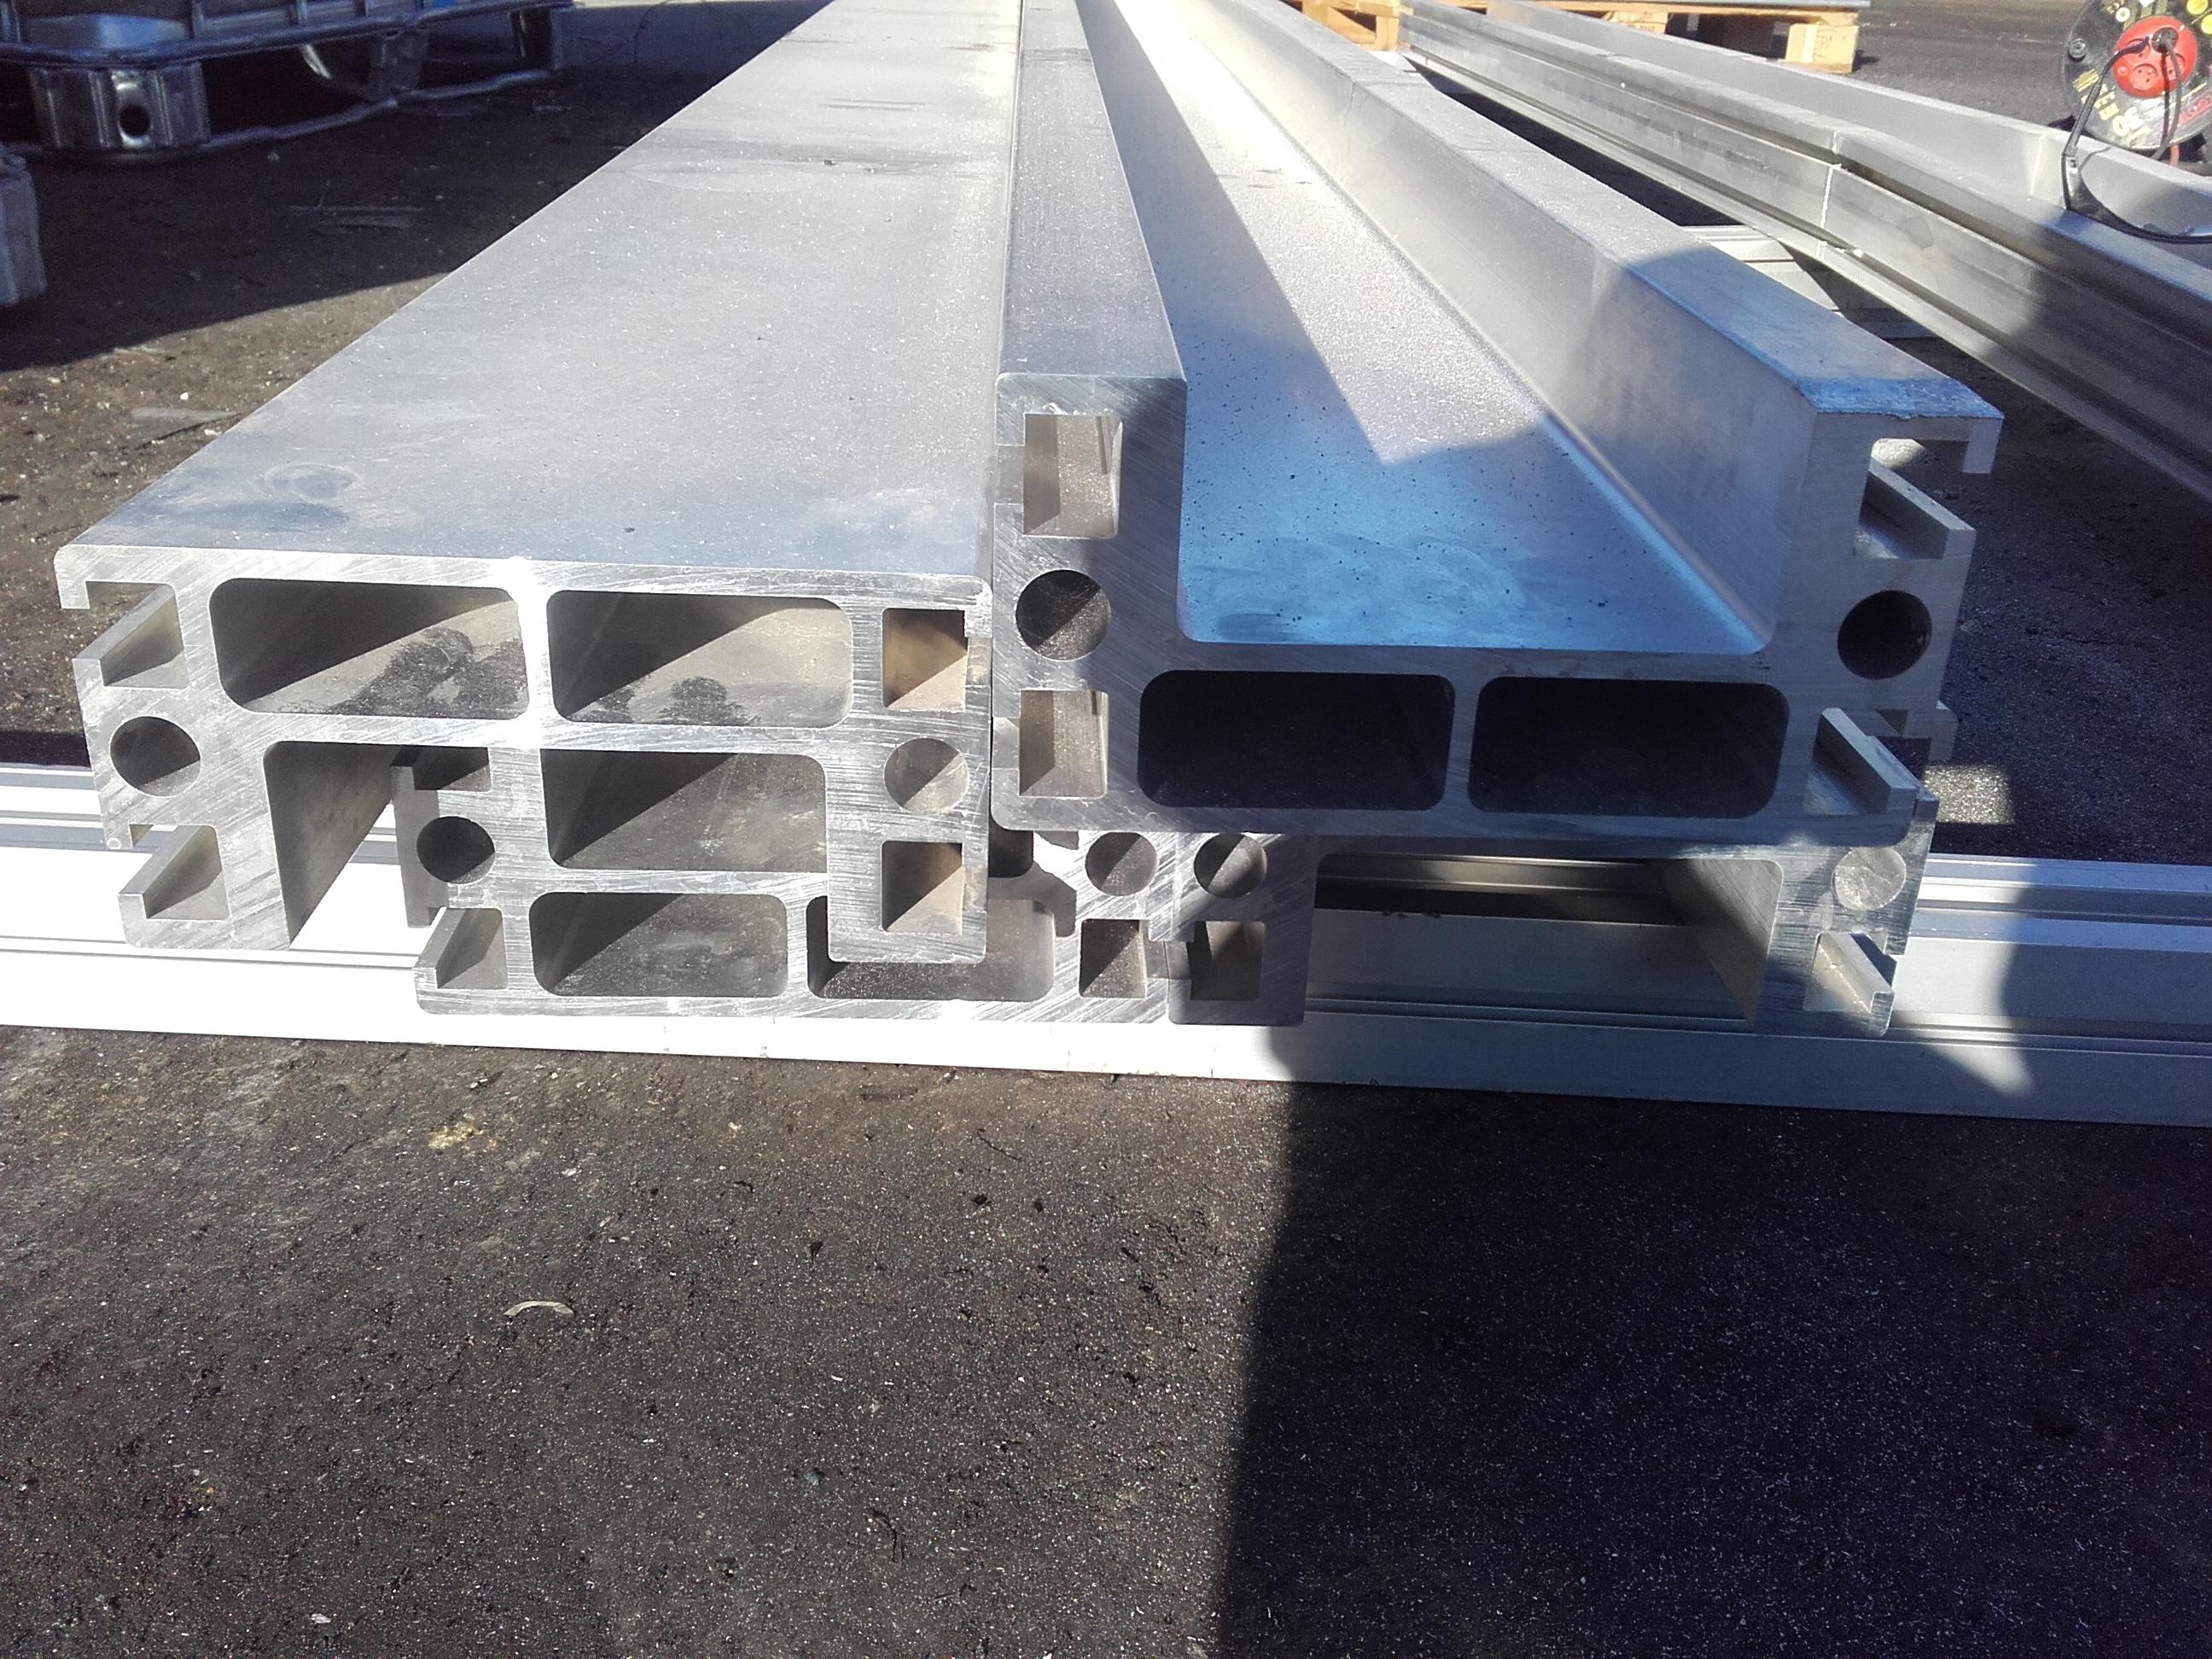 Cudowna Sprzedam] Grube profile aluminiowe CNC C beam - elektroda.pl UE12